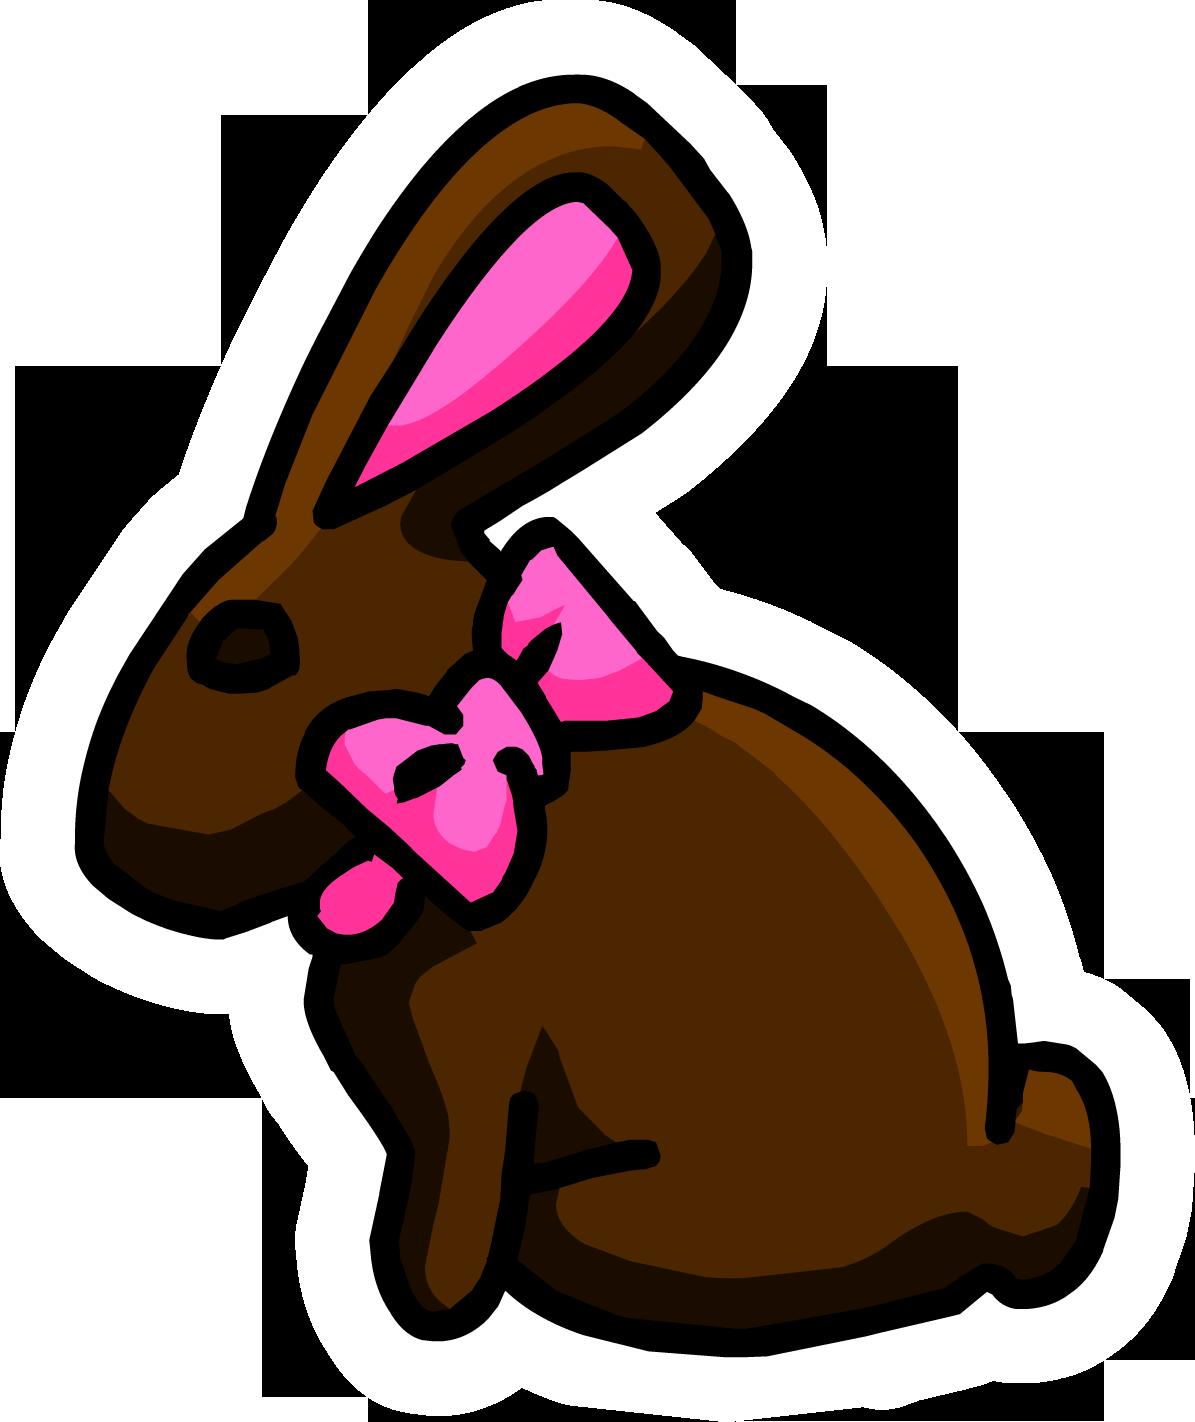 Clipart rabbit swimming. Chocolate bunny pin club